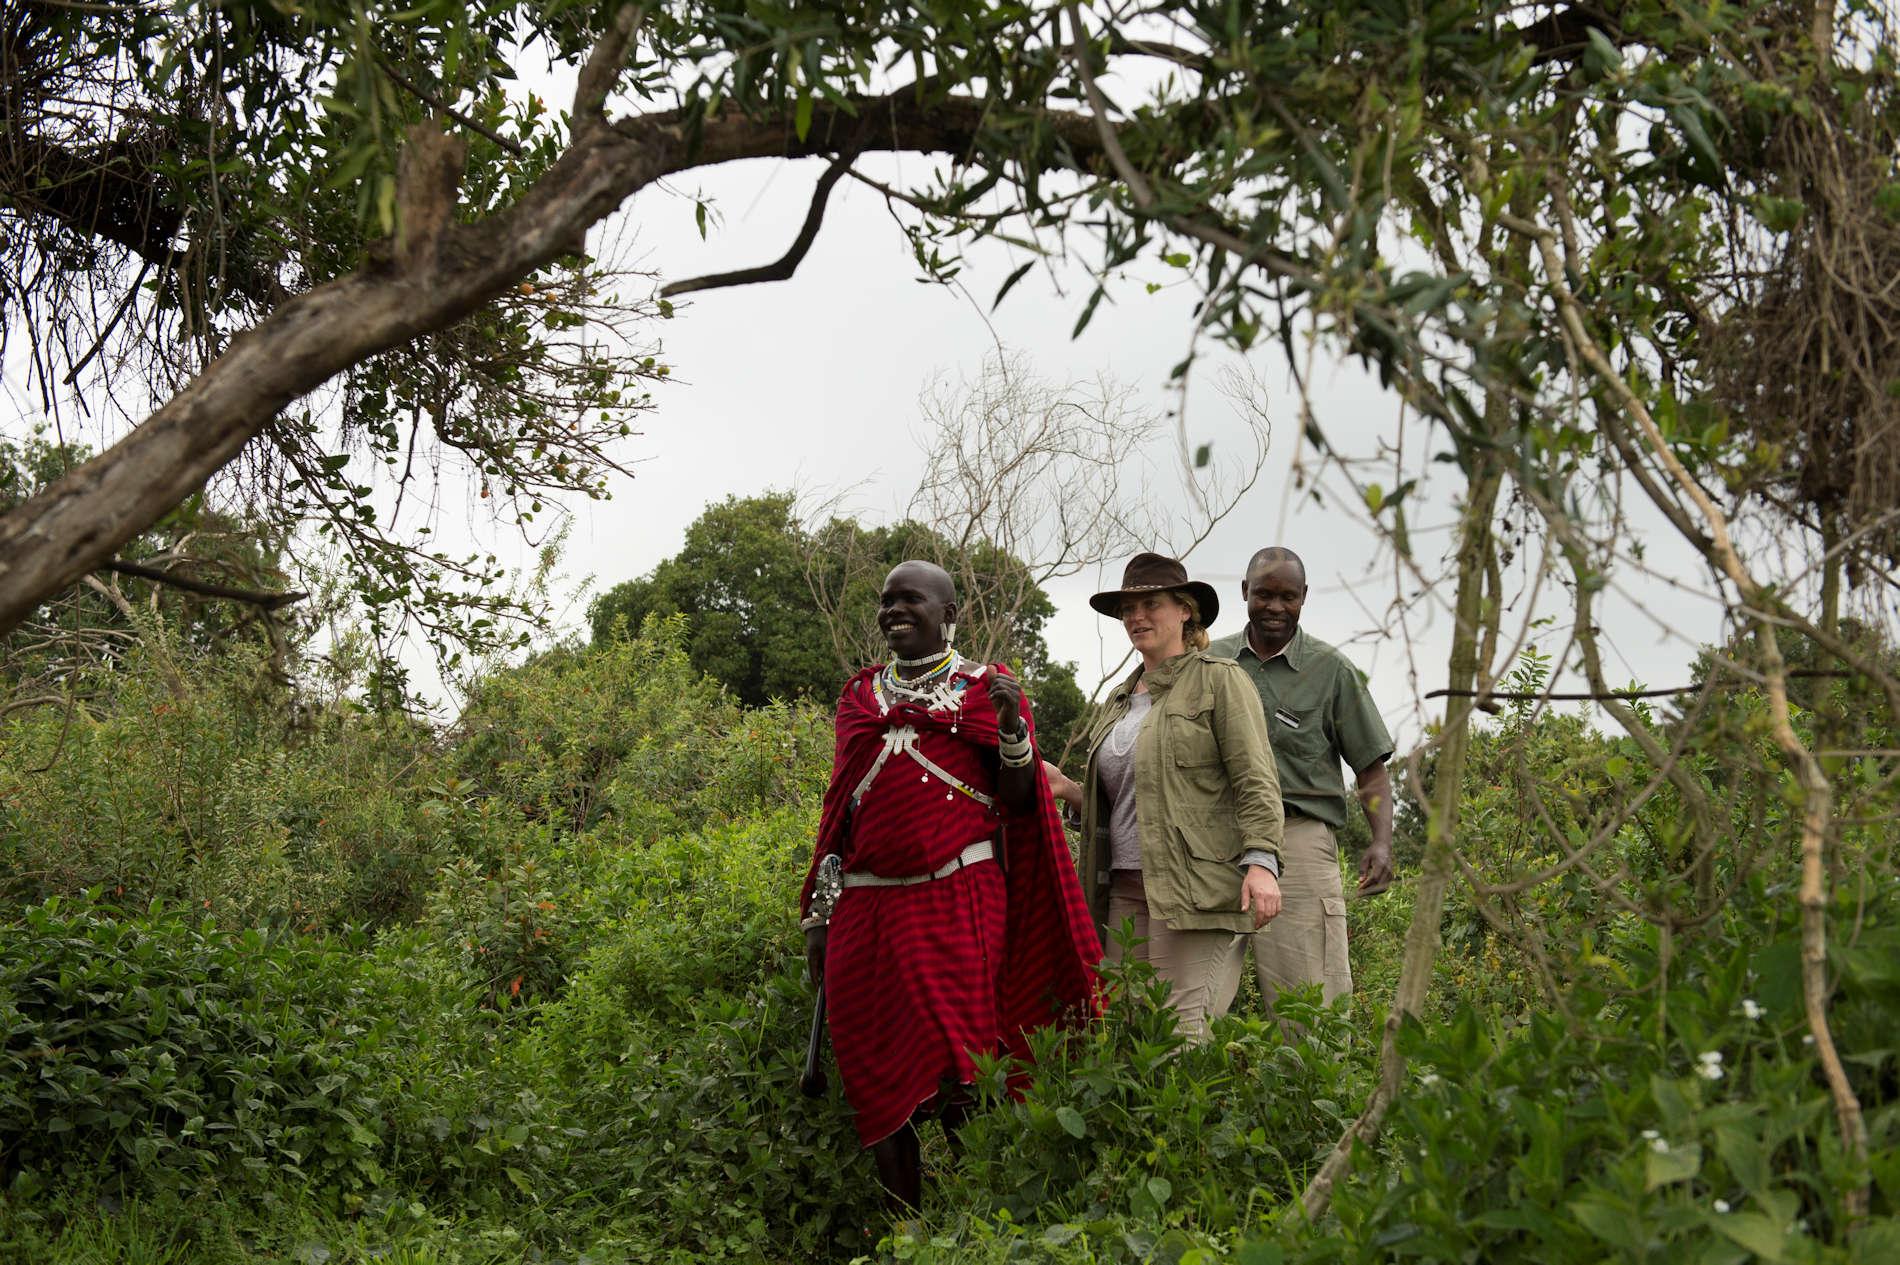 Wanderung durch Ngorongoro Nationalpark - Asilia Africa